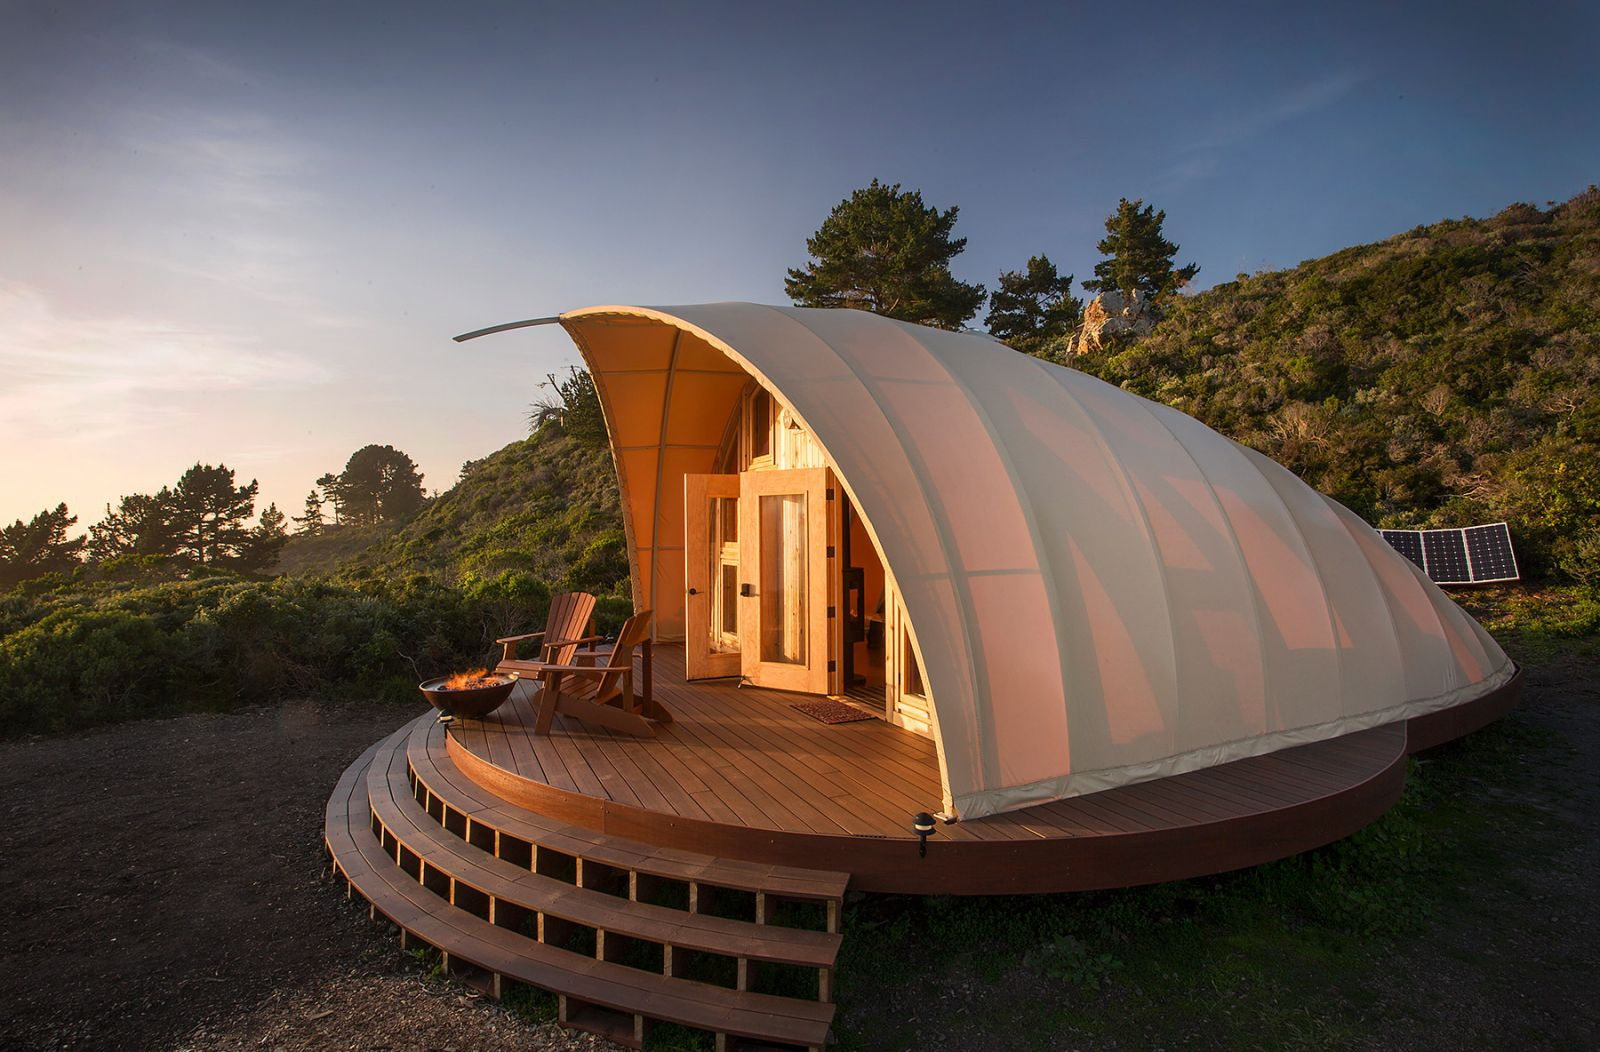 luxus camping glamping mobile architektur autonomous tent